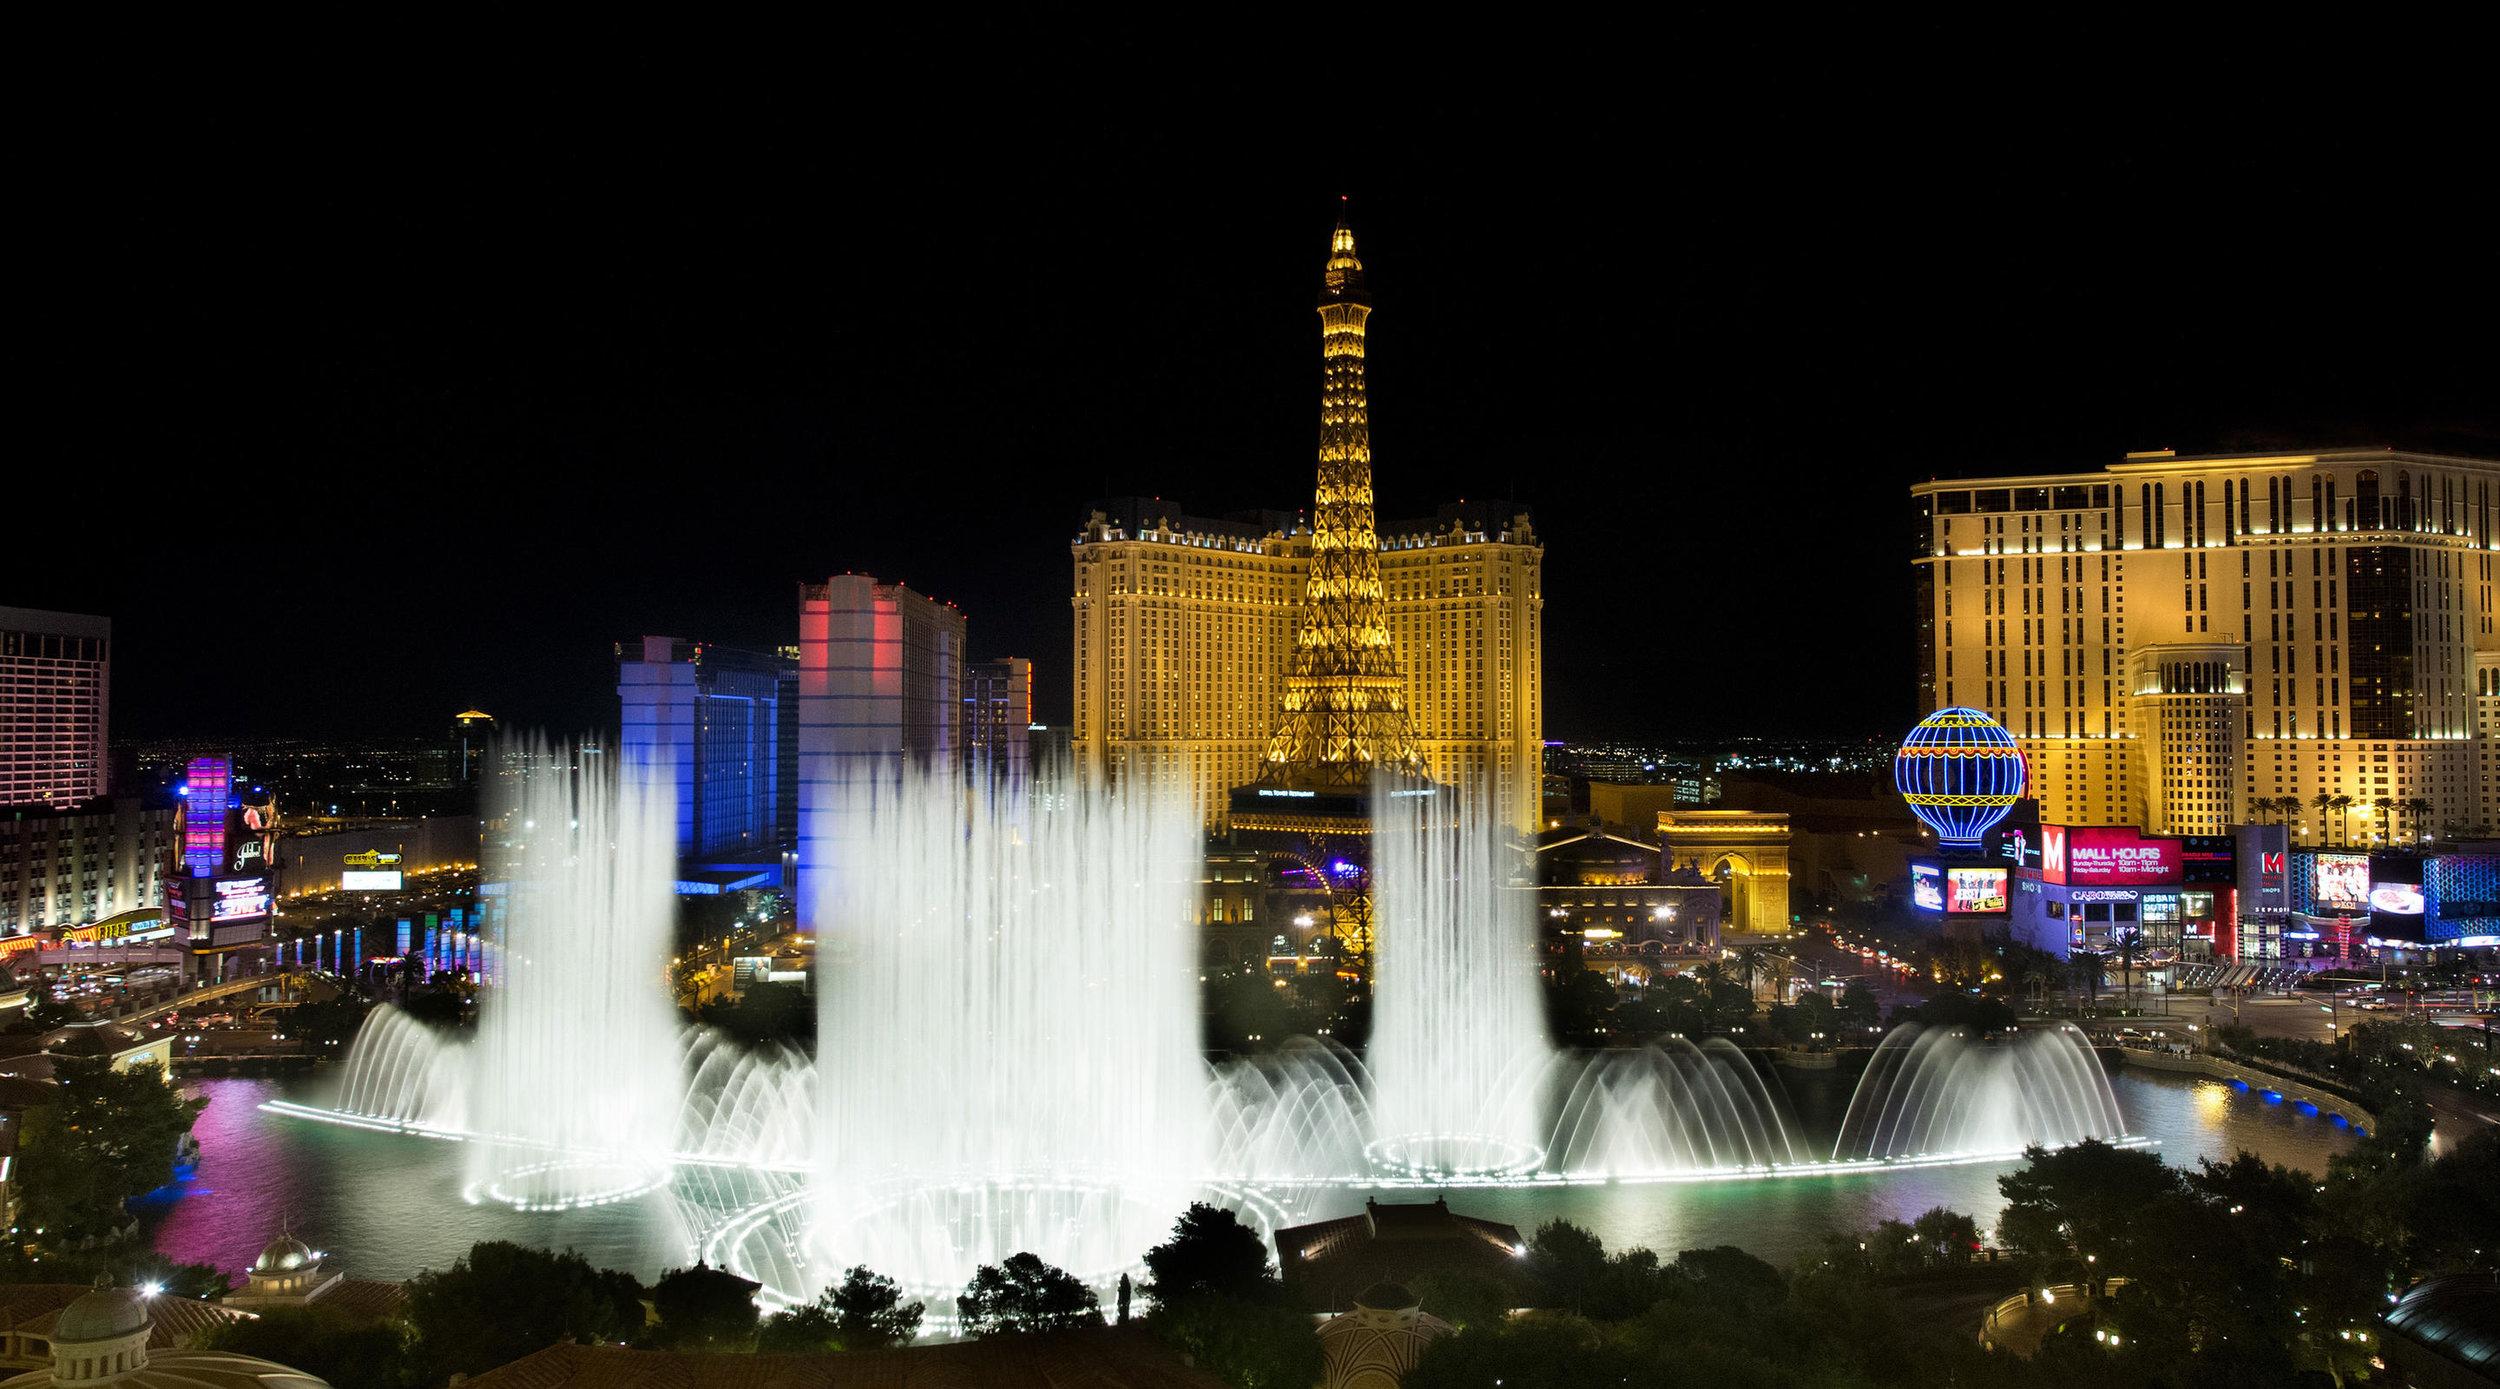 The Bellagio Fountains show